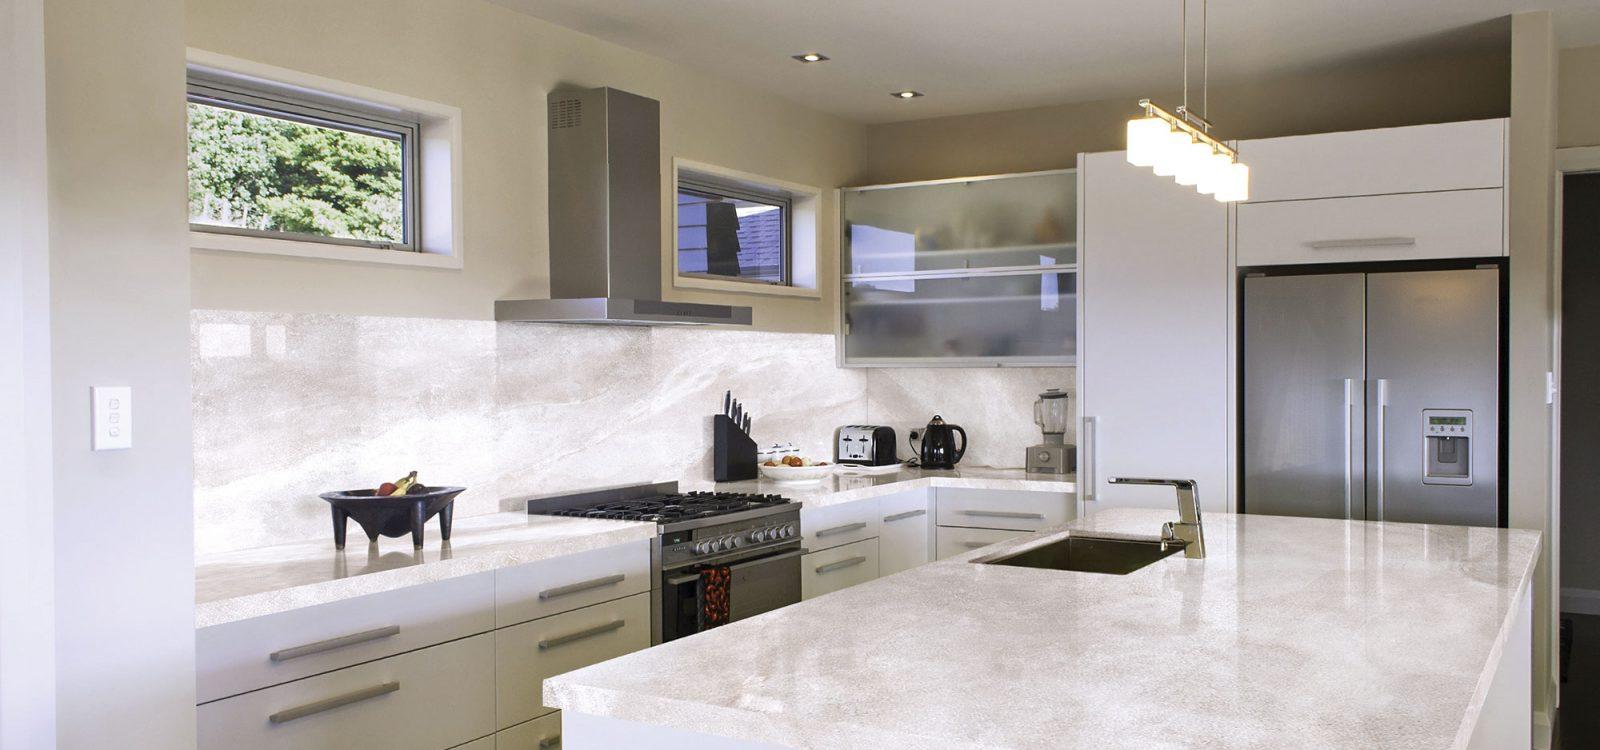 Kitchen Countertops - Trinity Tile Trinity Tile